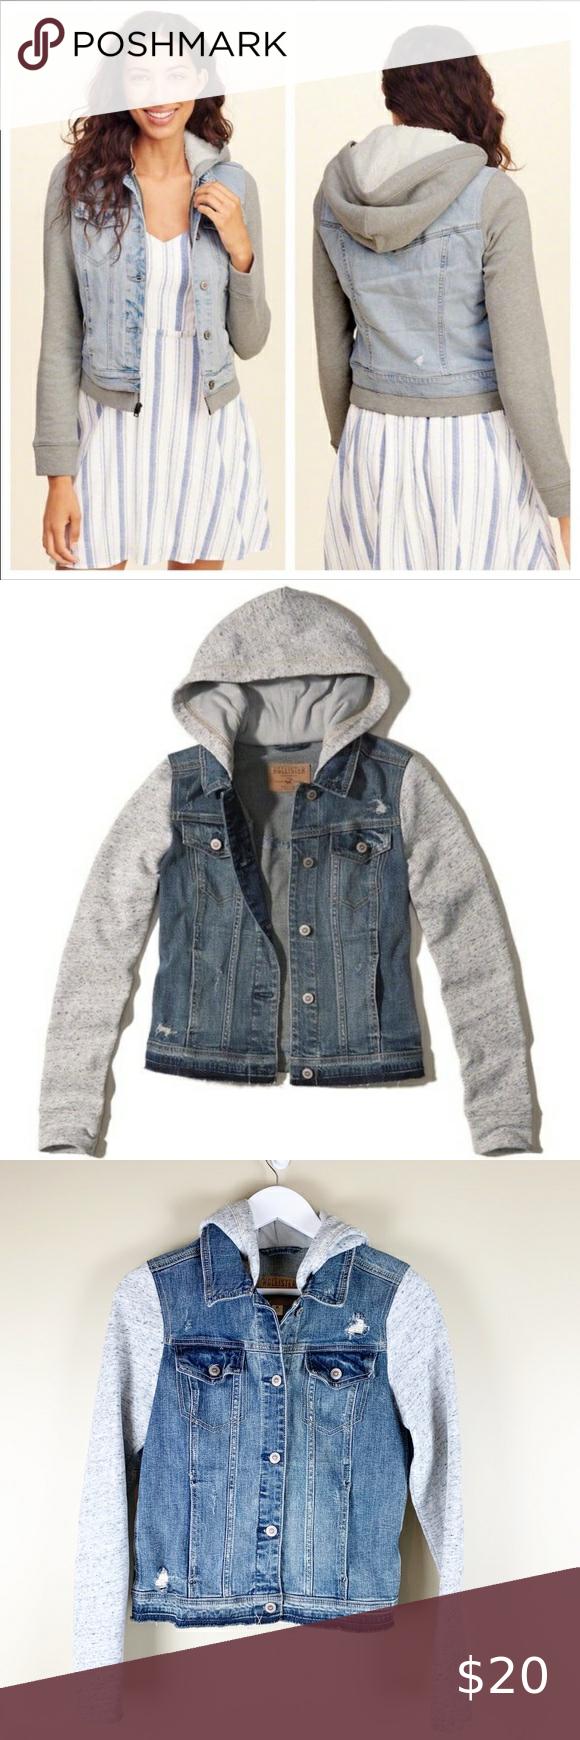 Hollister Sweatshirt Jean Jacket Excellent Preowned Condition Size Medium Hollister Jackets Sweatshirt Jean Jacket Destroyed Denim Jacket Cropped Black Jeans [ 1740 x 580 Pixel ]